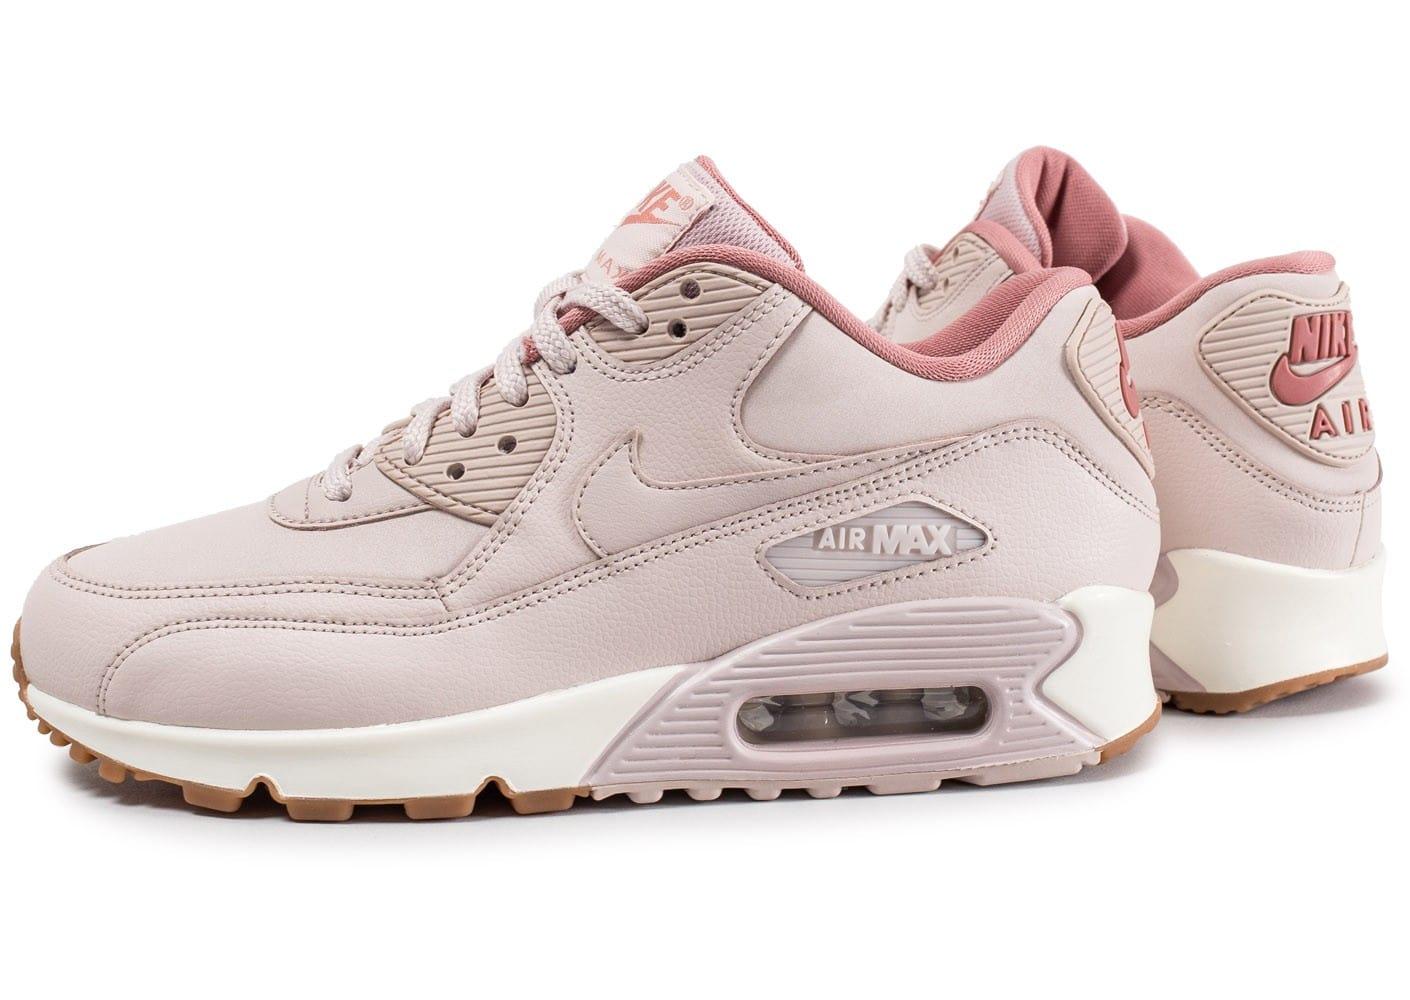 Pas Air Promotions Cher Max Femme 47 R Jusqu Nike HqAISPpw